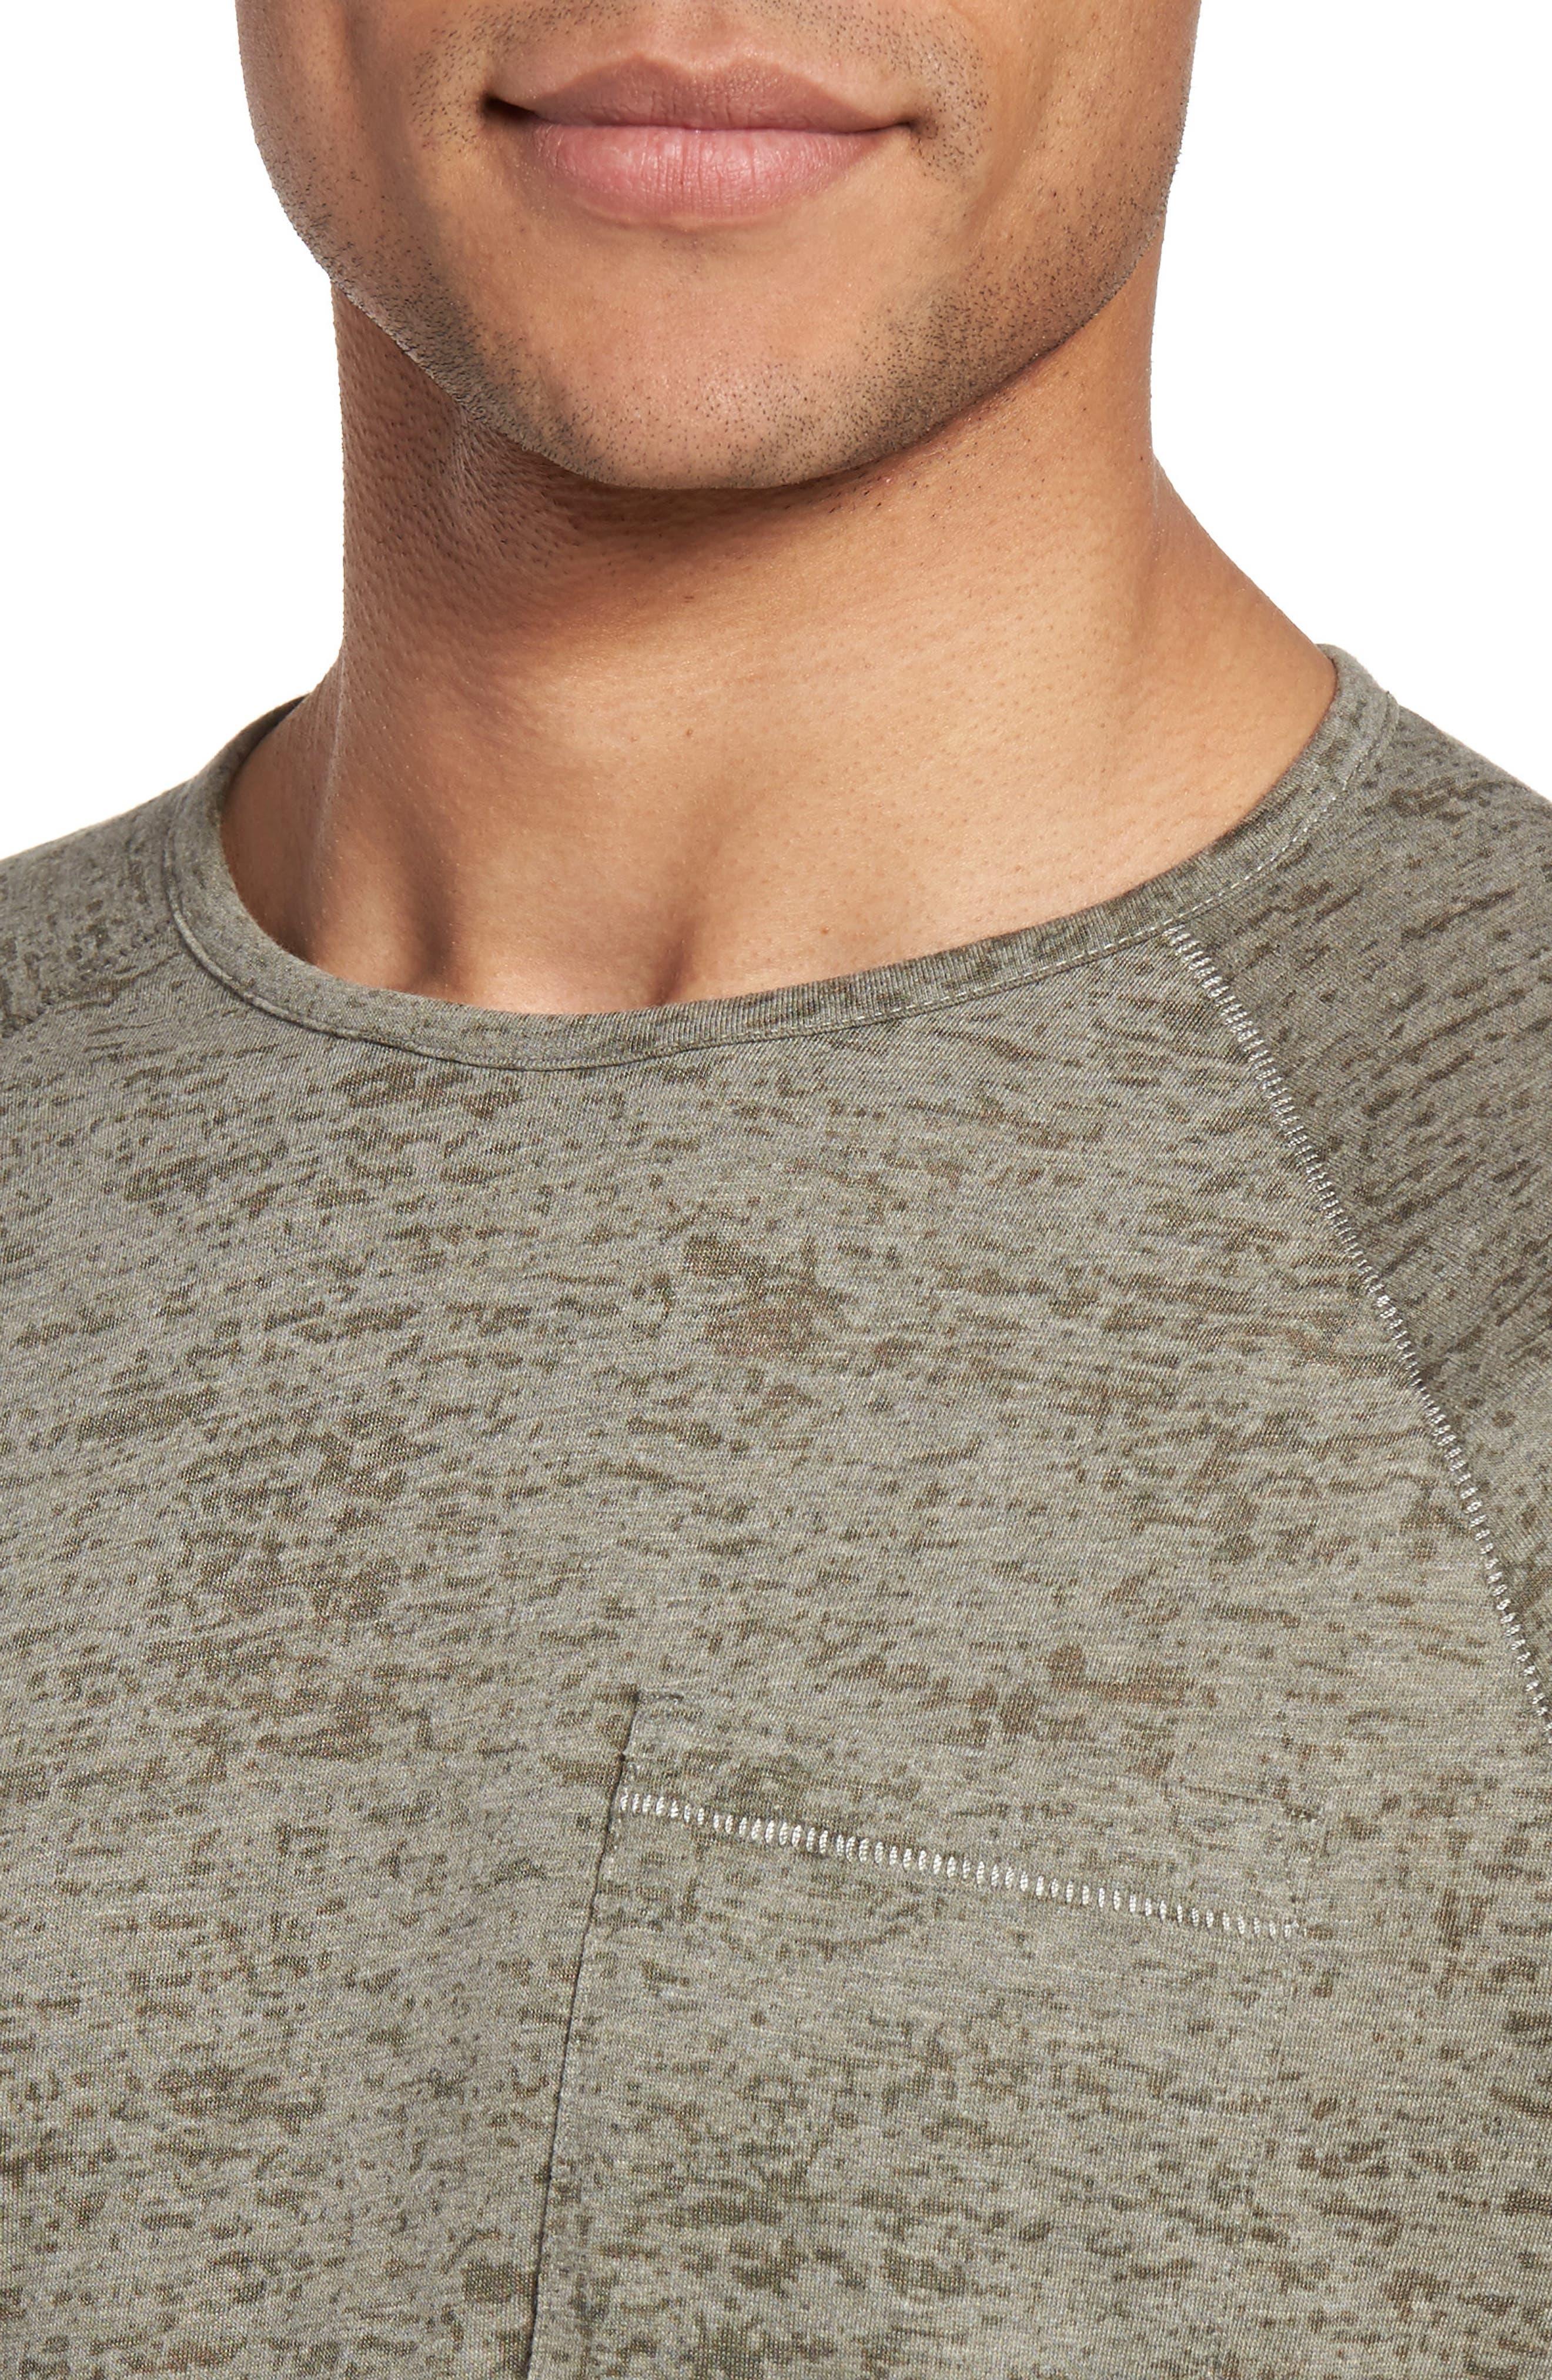 Raglan Sleeve T-Shirt,                             Alternate thumbnail 4, color,                             332